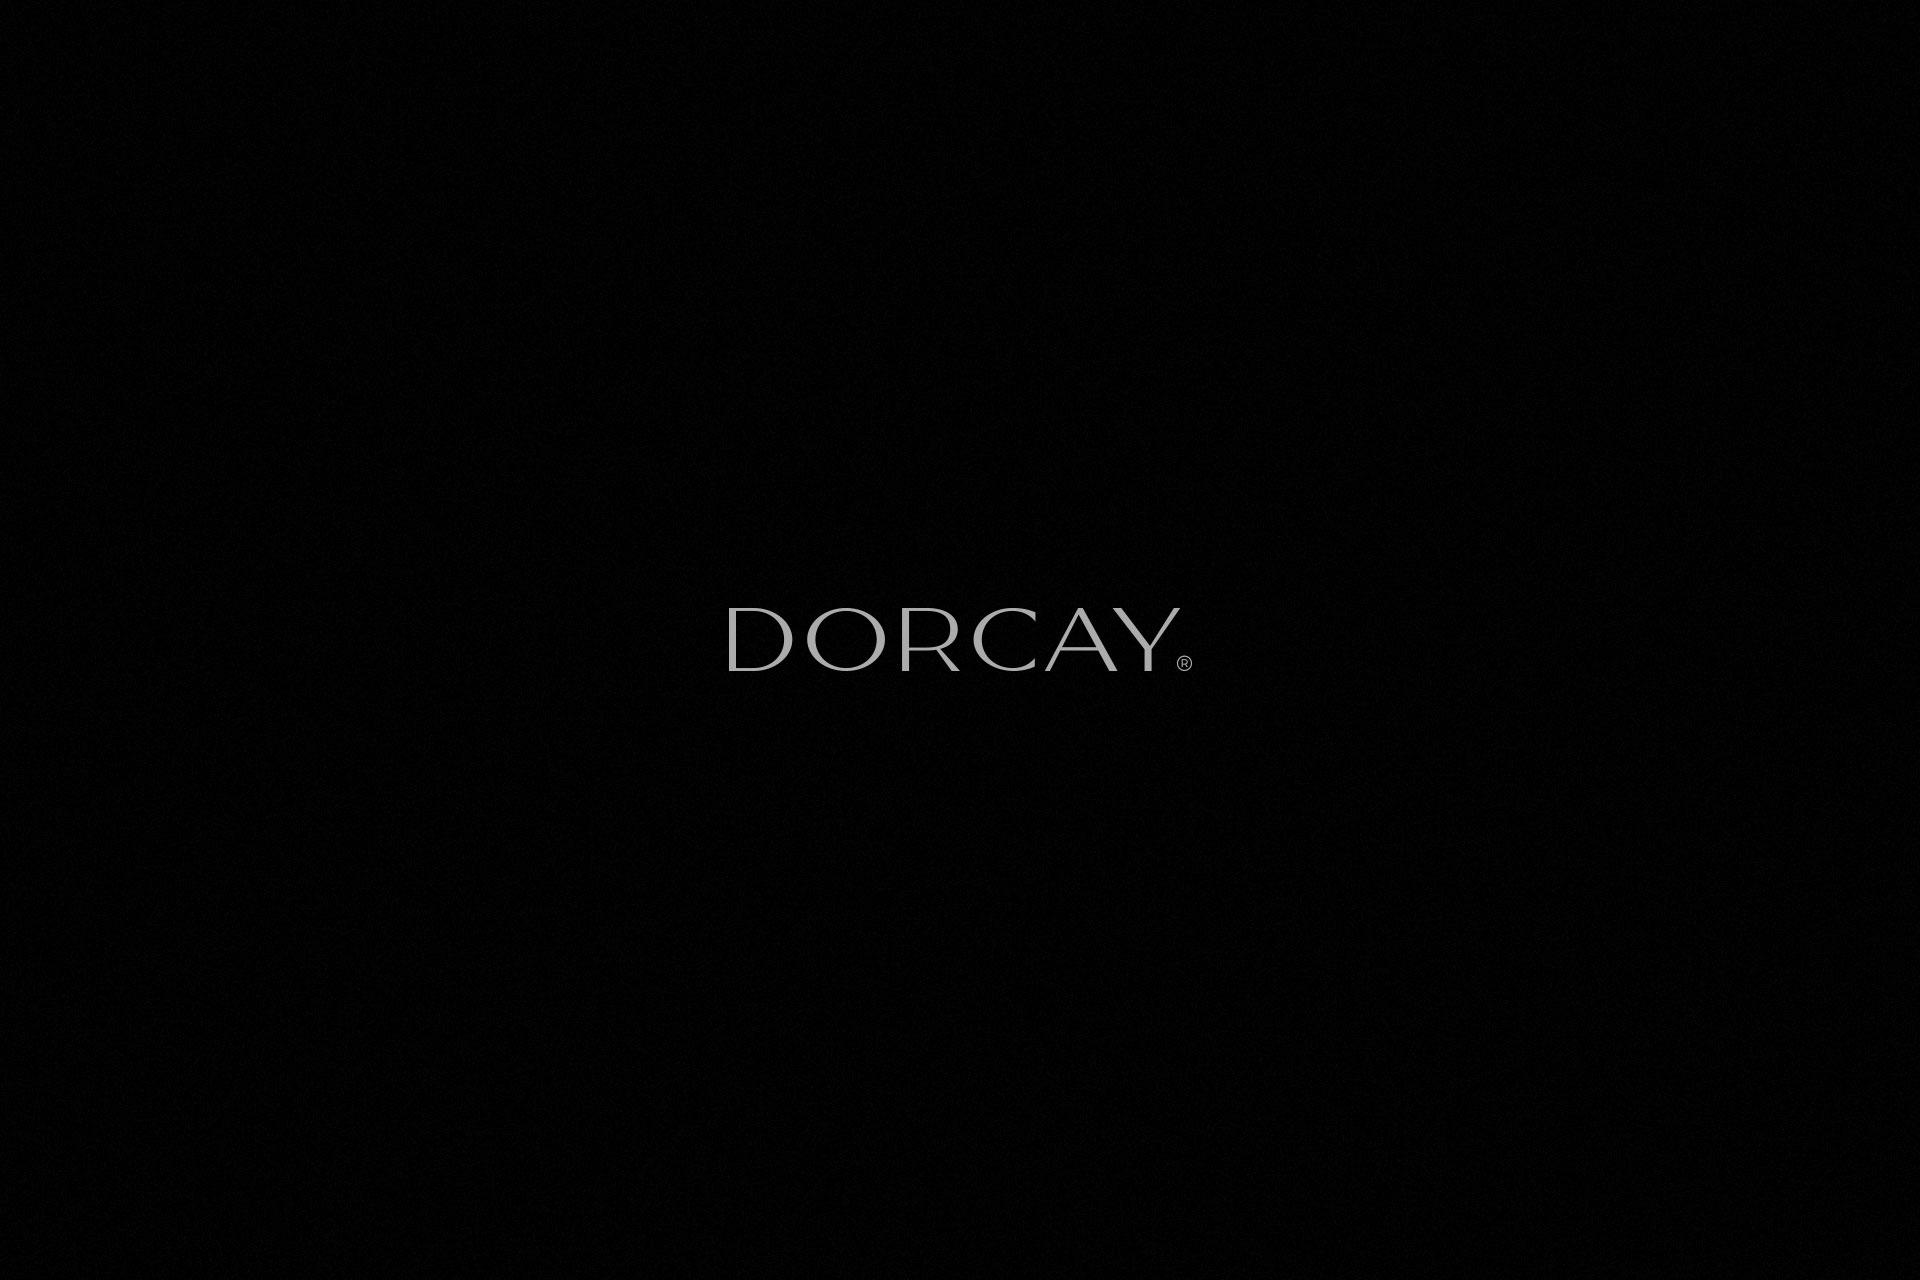 Logos & Brandmarks Dorcay